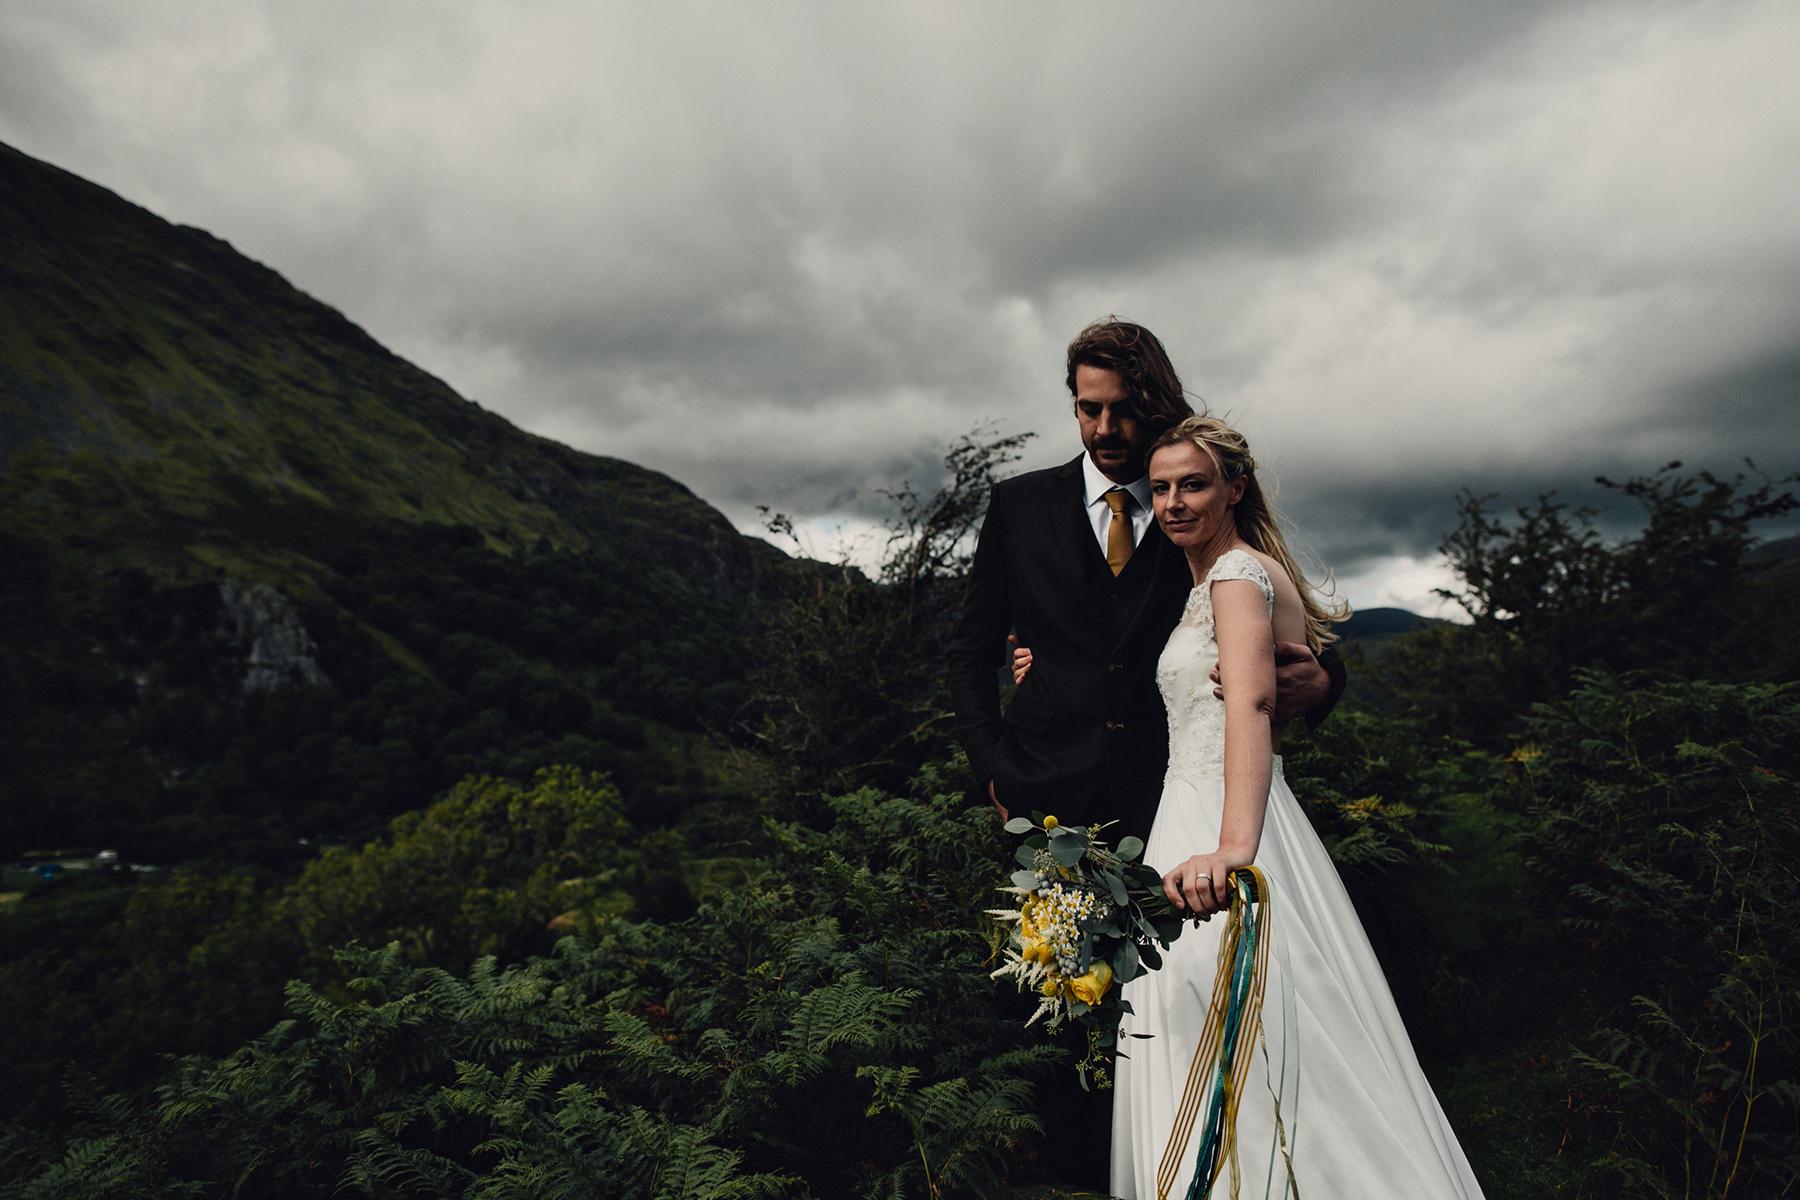 Snowdonia-Wales-Wedding-Photos-0370.jpg